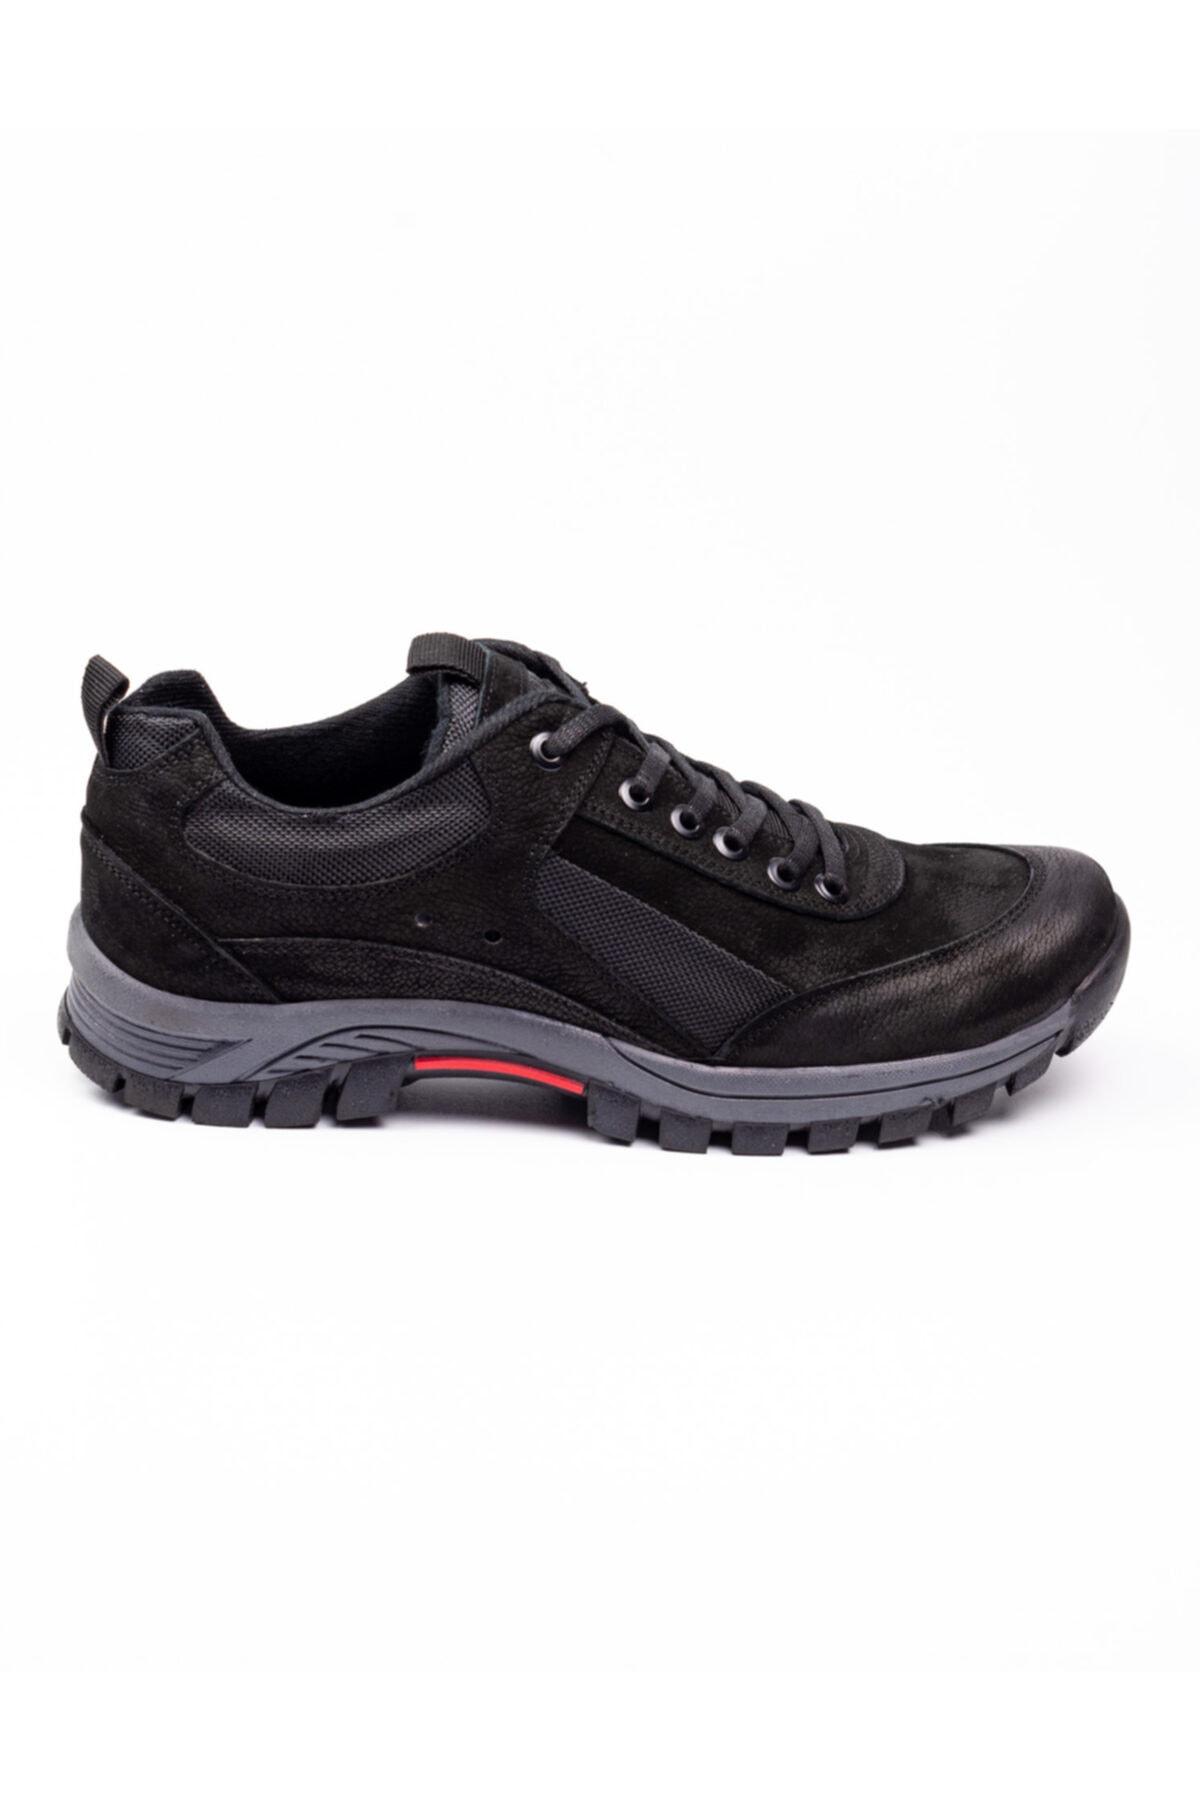 Bulldozer Siyah Erkek Outdoor Ayakkabı Siyah-44 200130 2